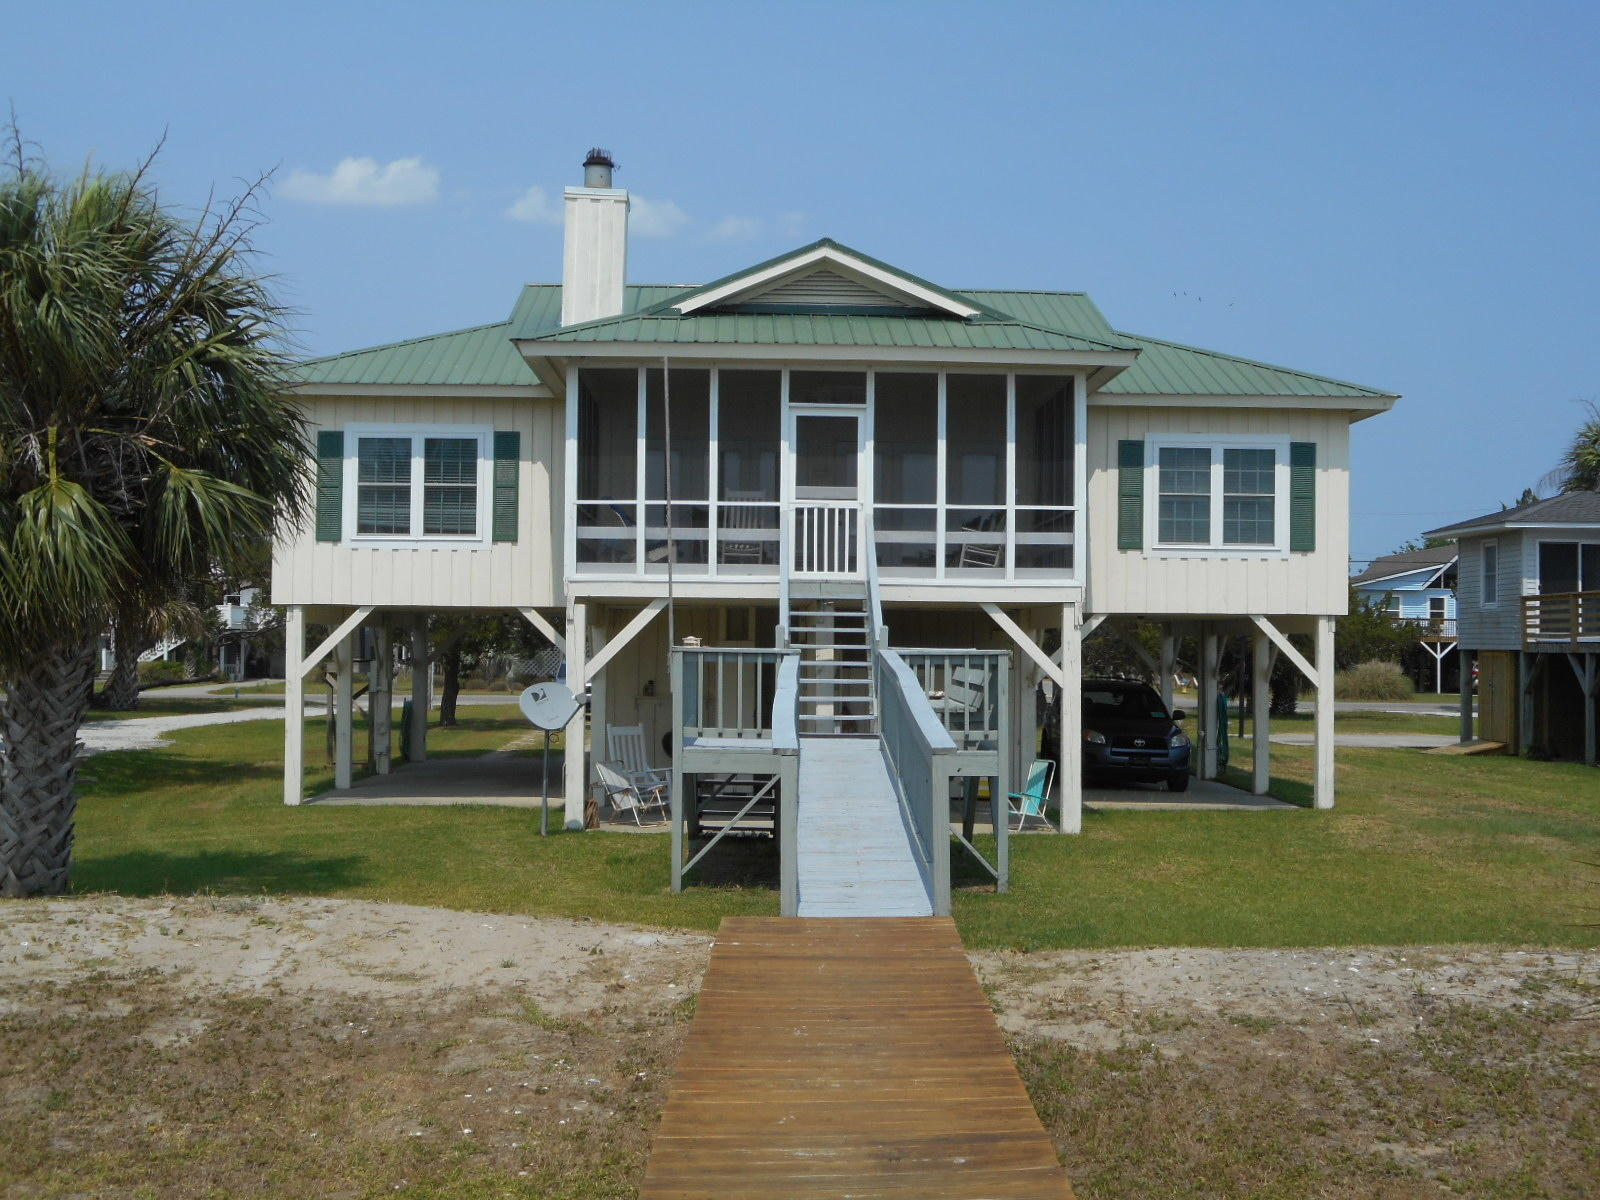 Beachfront Homes For Sale - 3608 Yacht Club, Edisto Beach, SC - 8